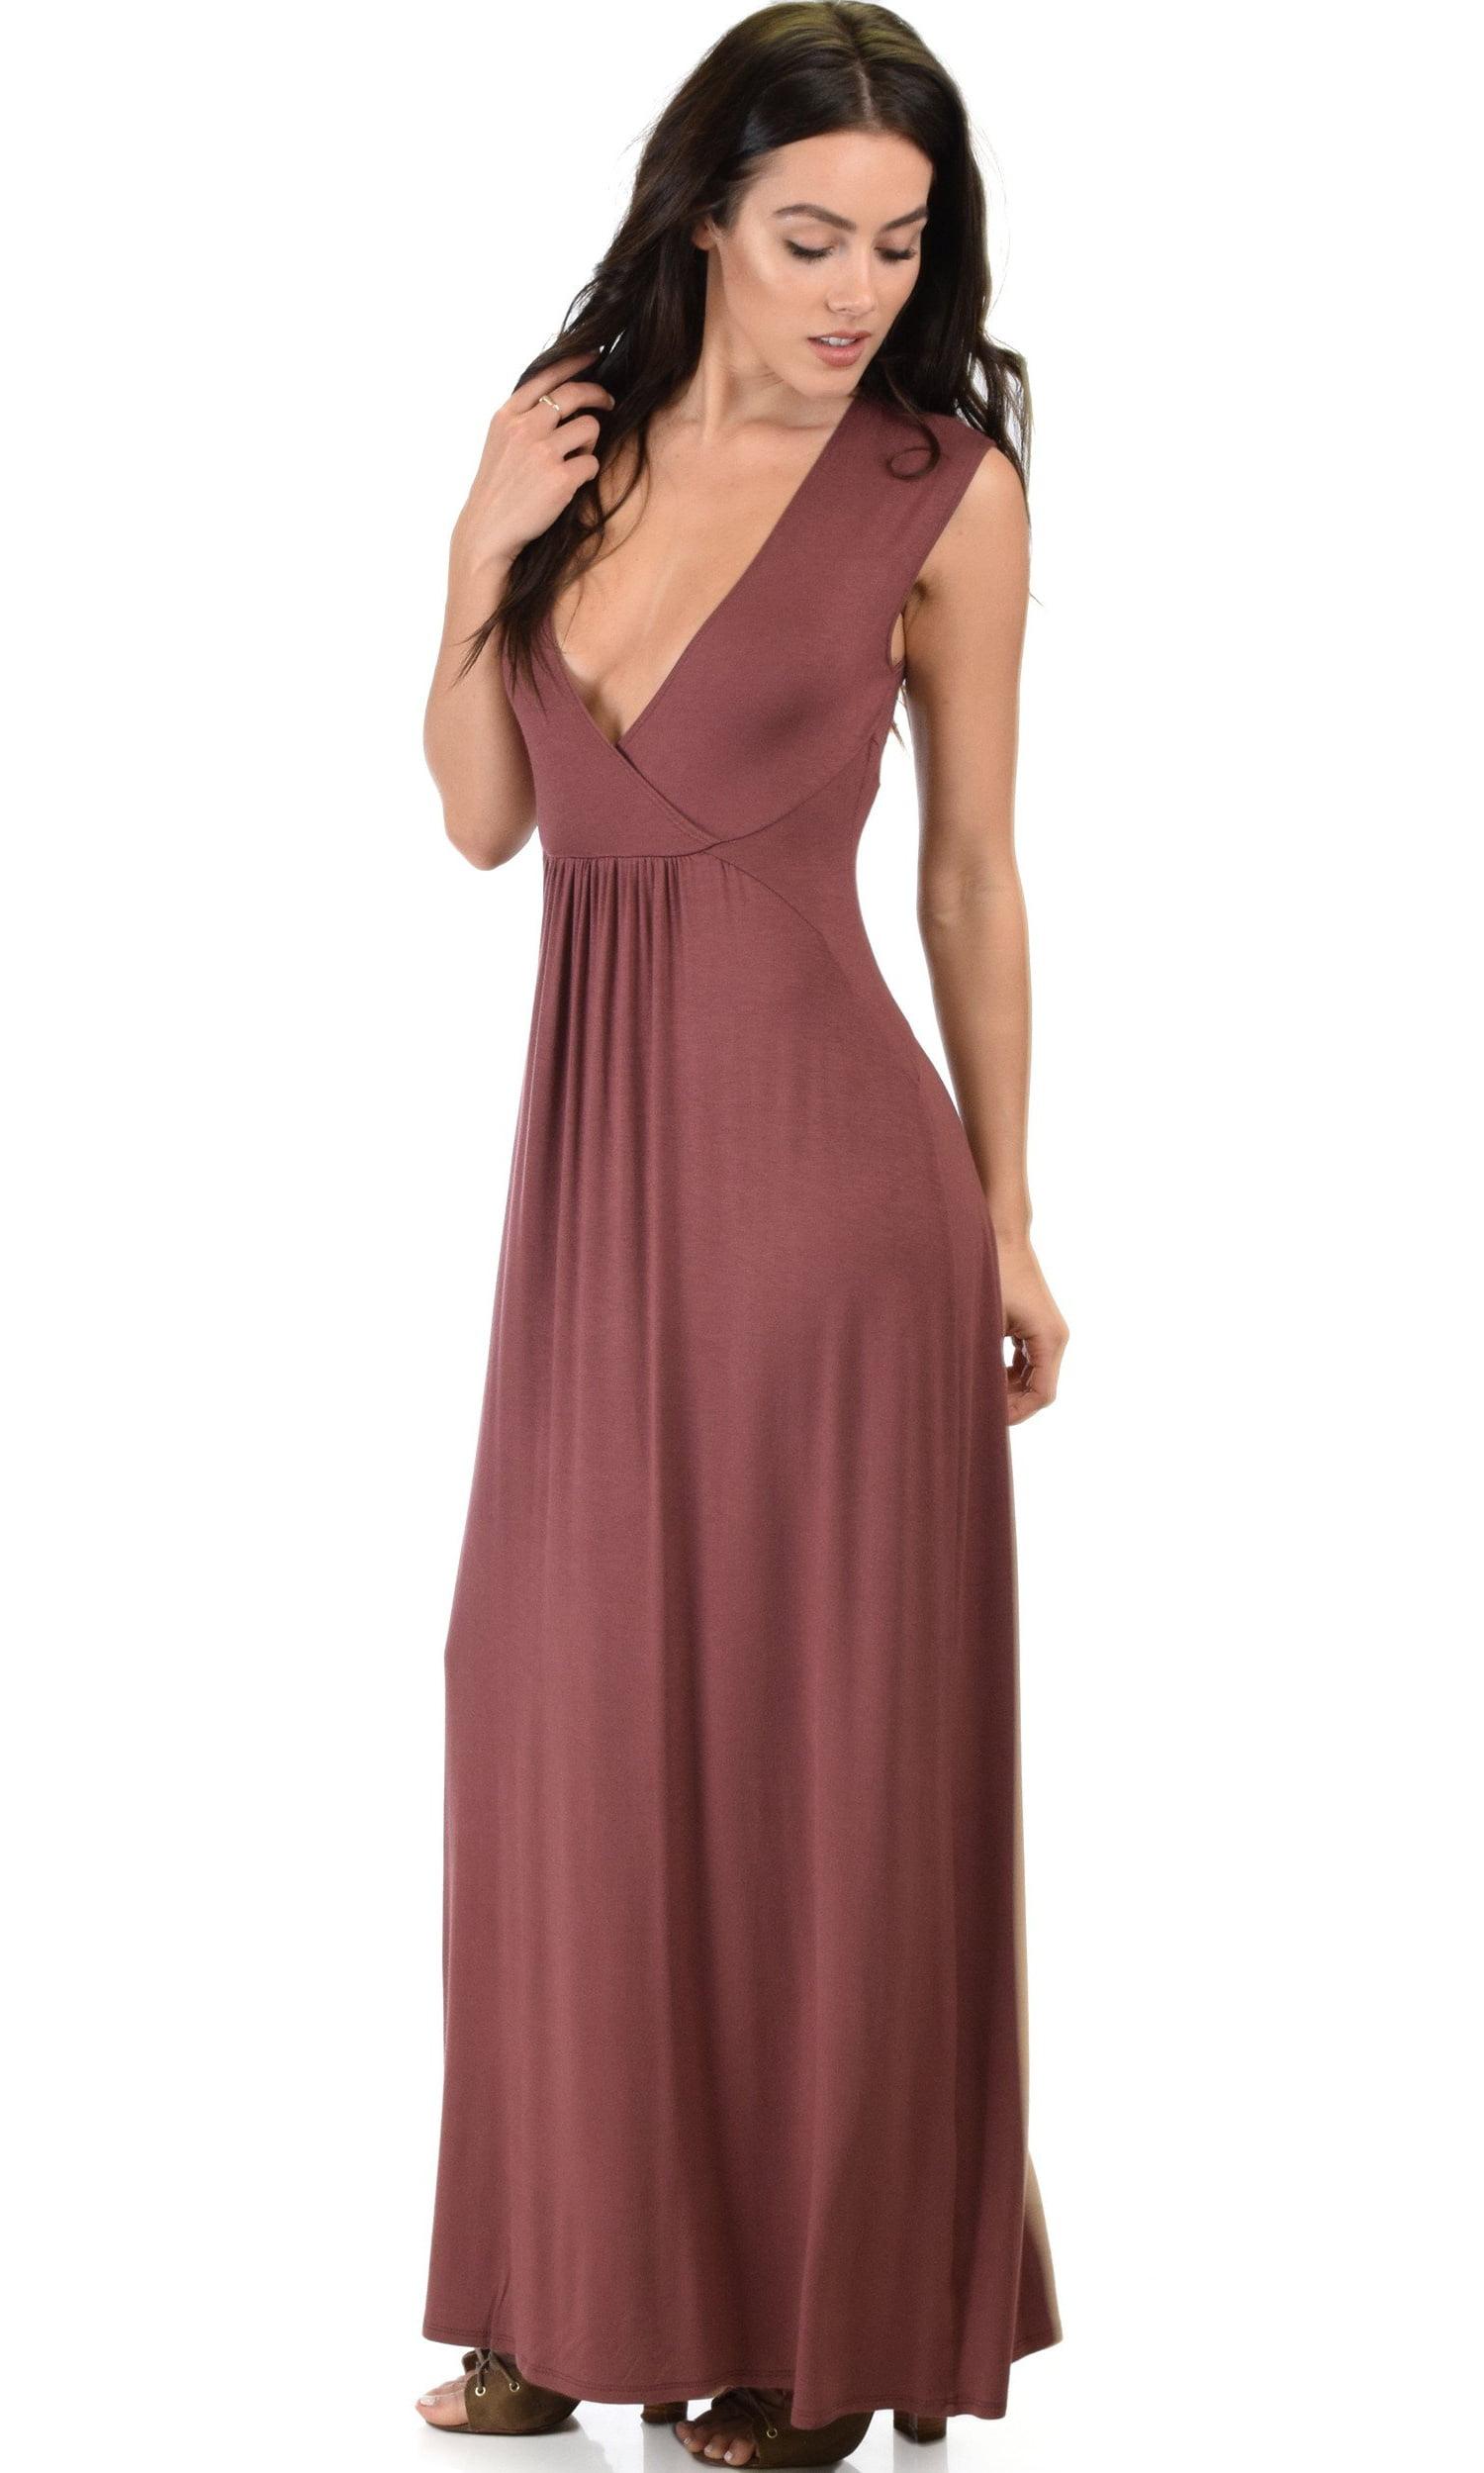 76df7f563c5 Lyss Loo - Lyss Loo Sweetest Kiss Sleeveless Long Maxi Dress